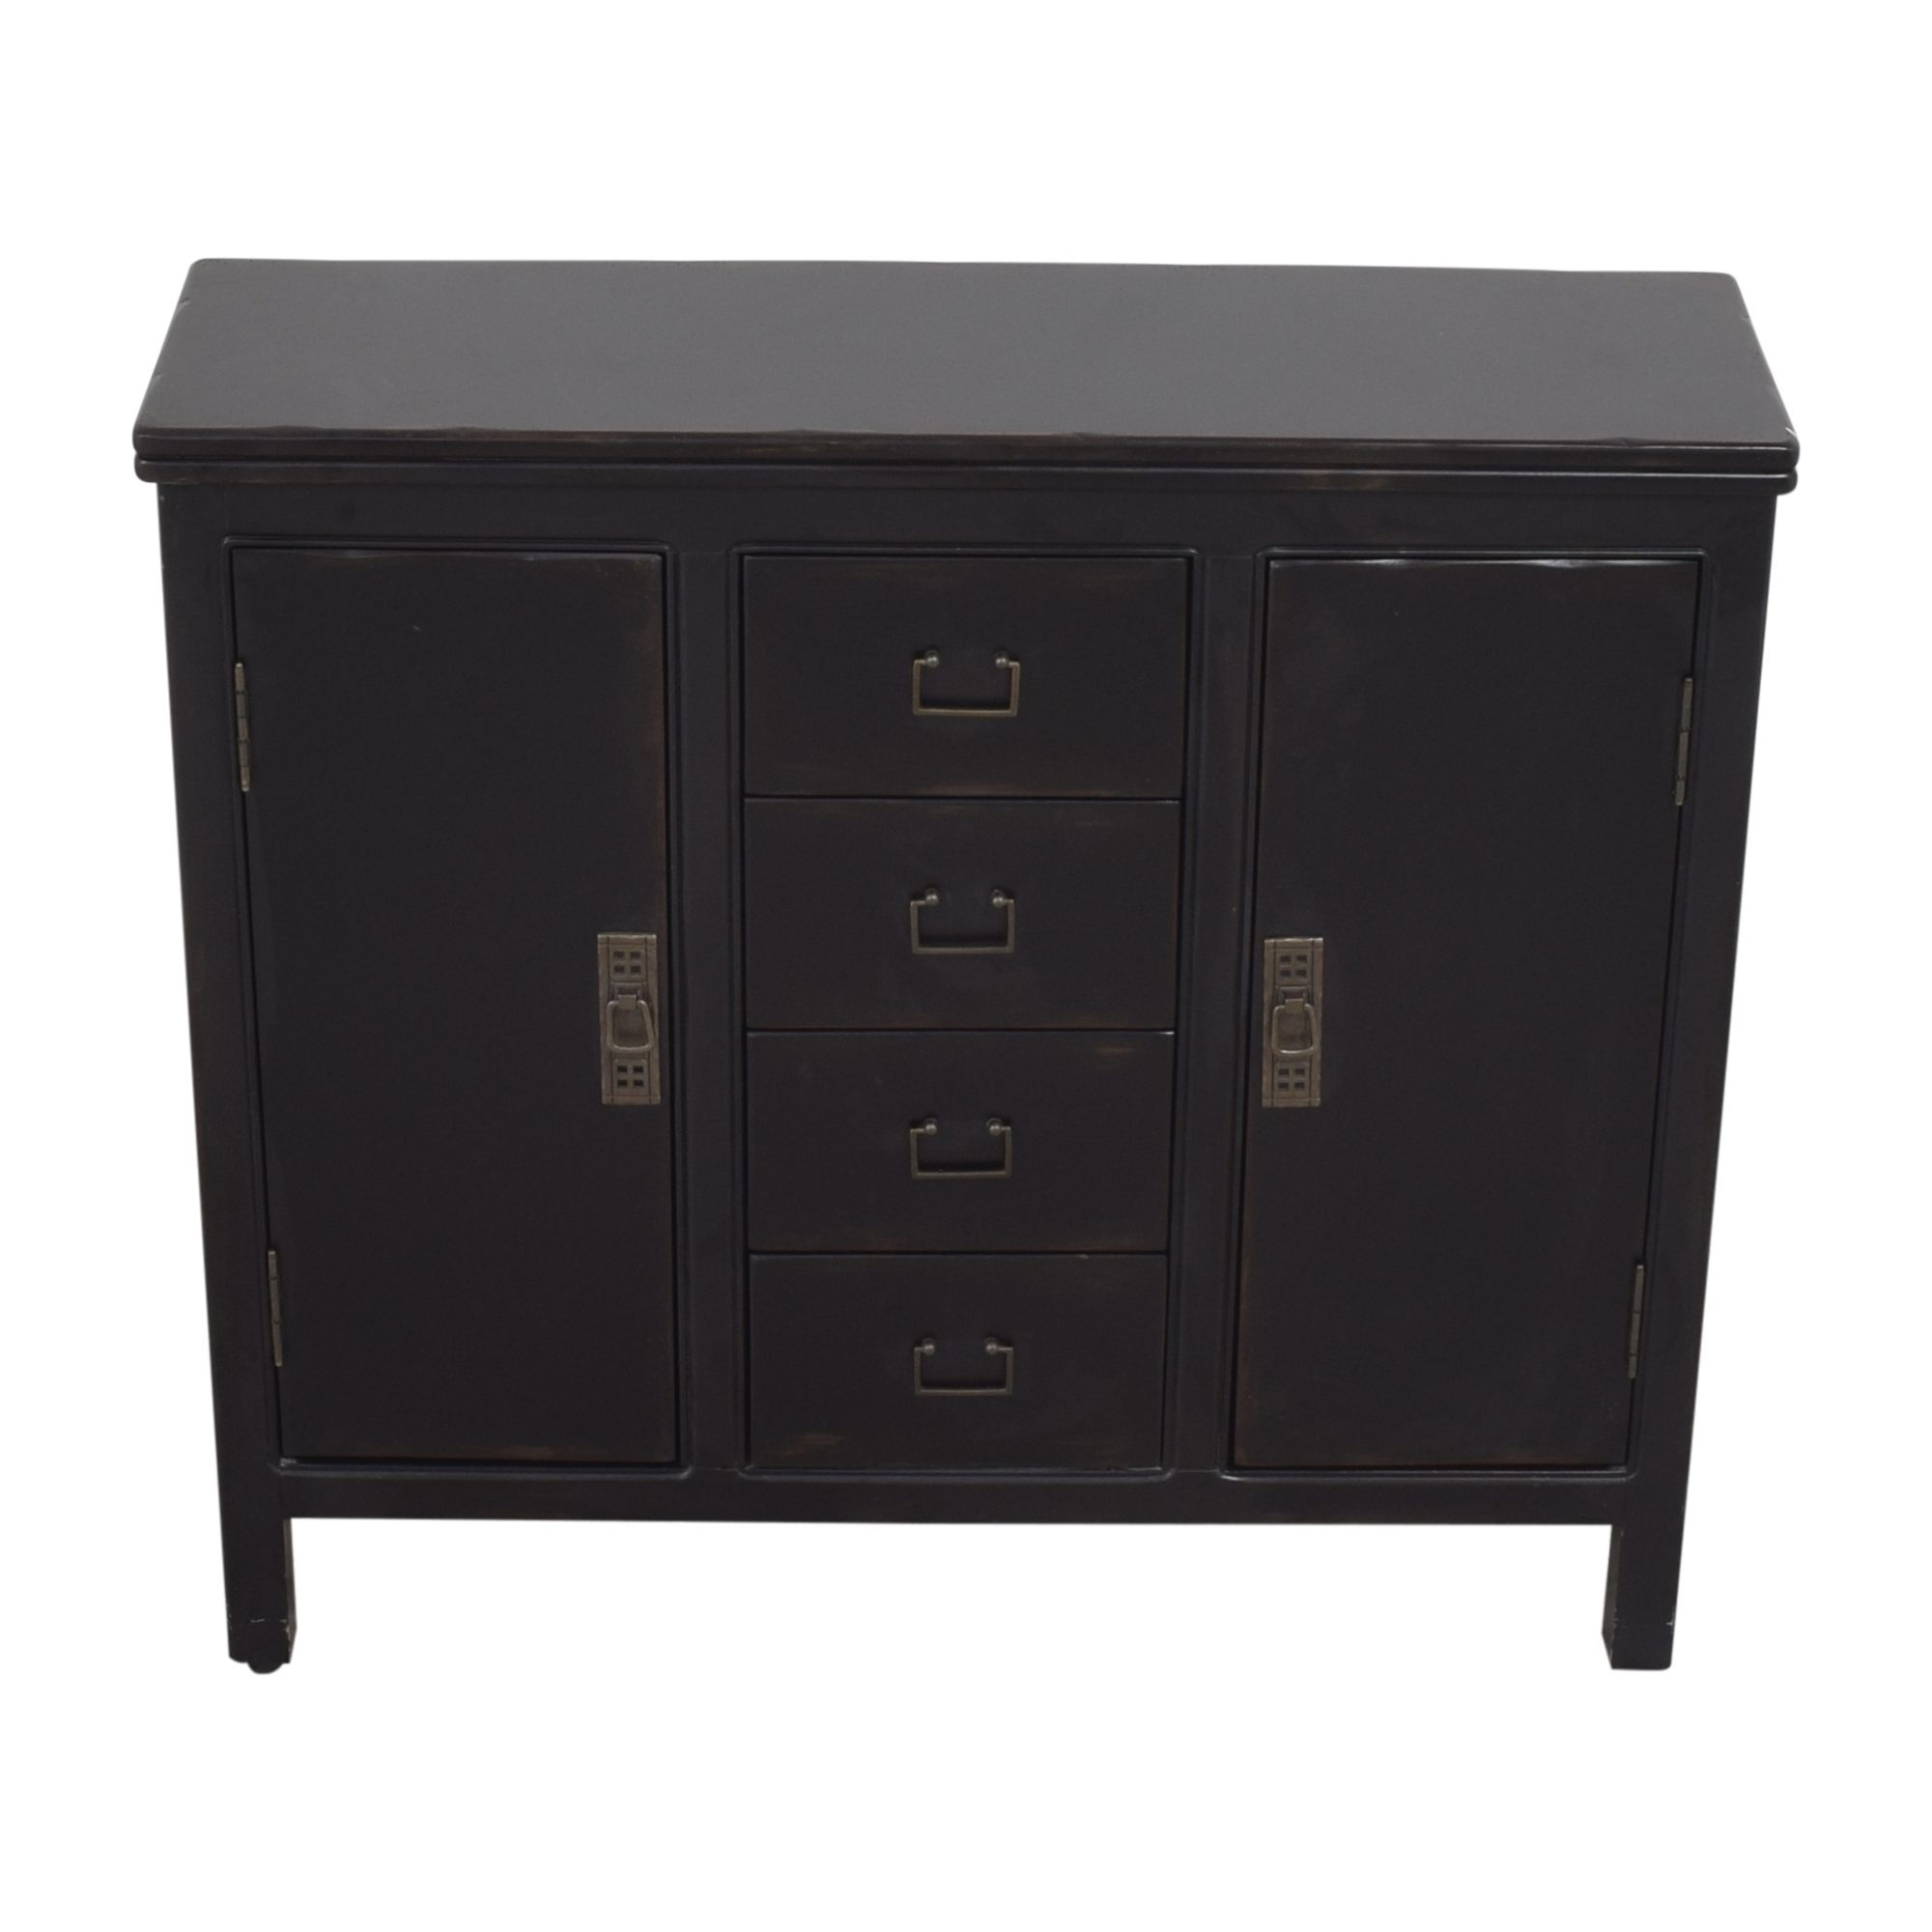 Hooker Furniture Hooker Furniture Chinoiserie Sideboard Cabinet ct